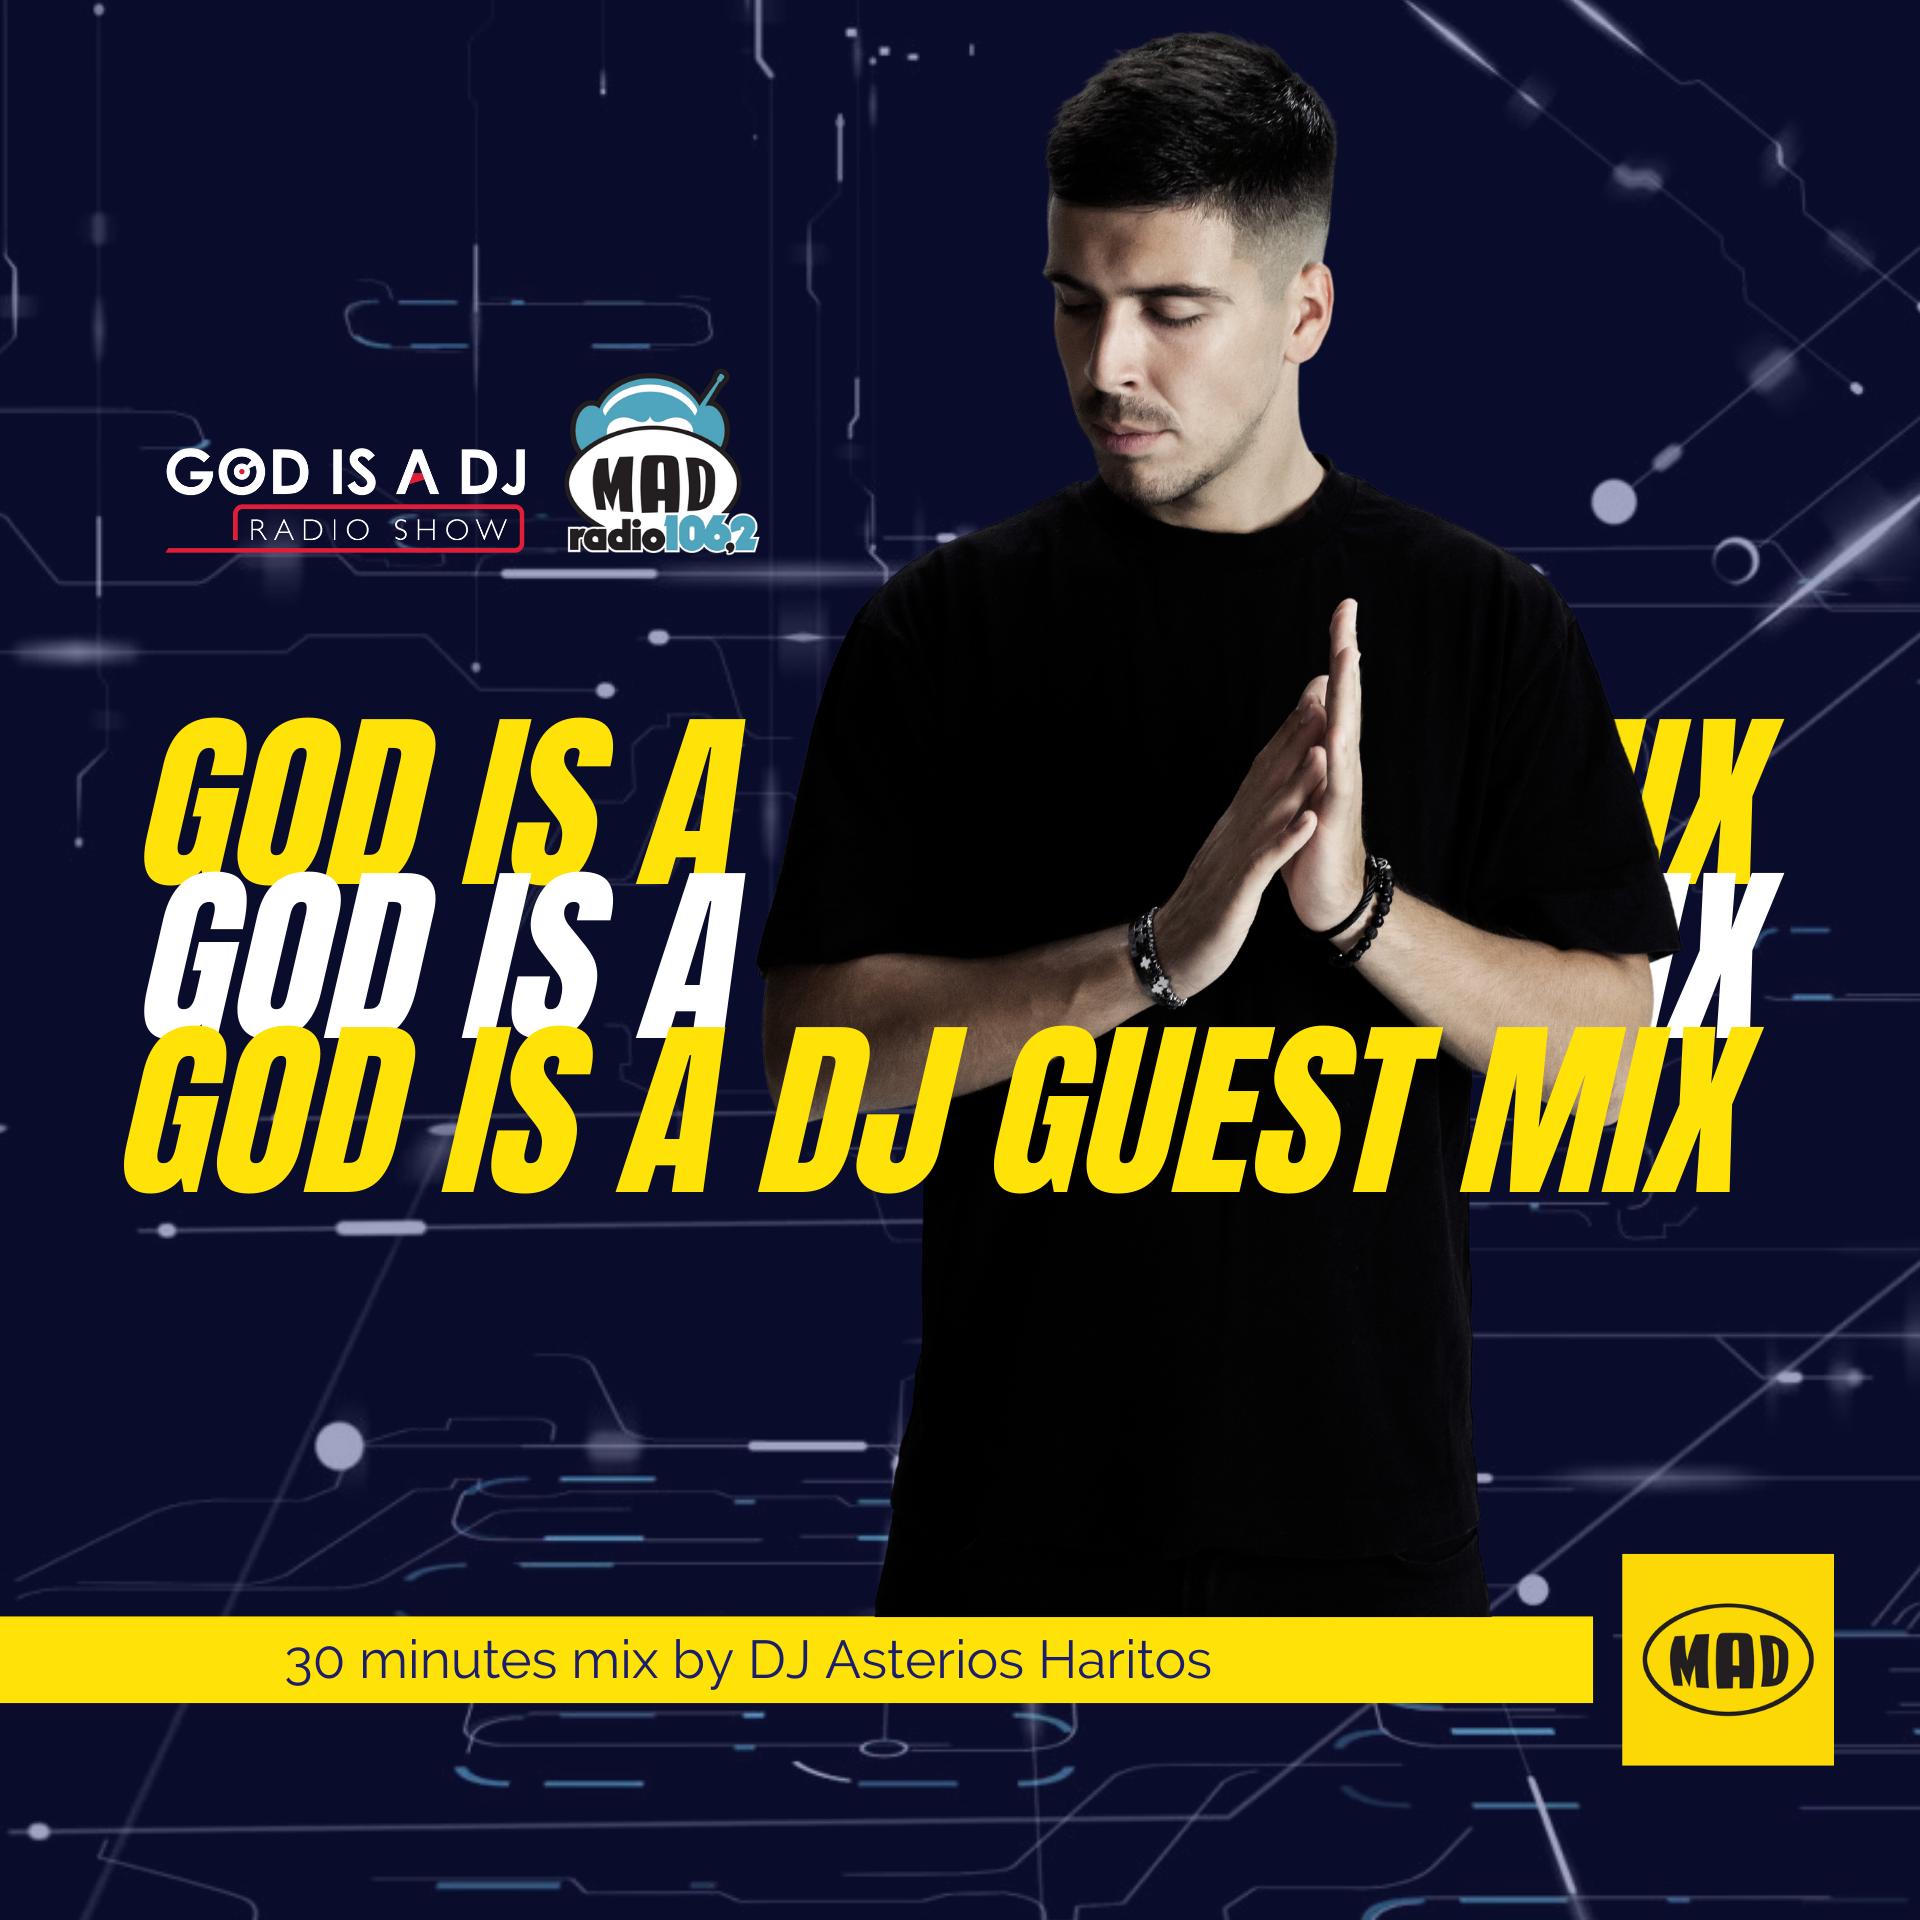 Asterios Haritos GodisaDJ Mad Radio mix